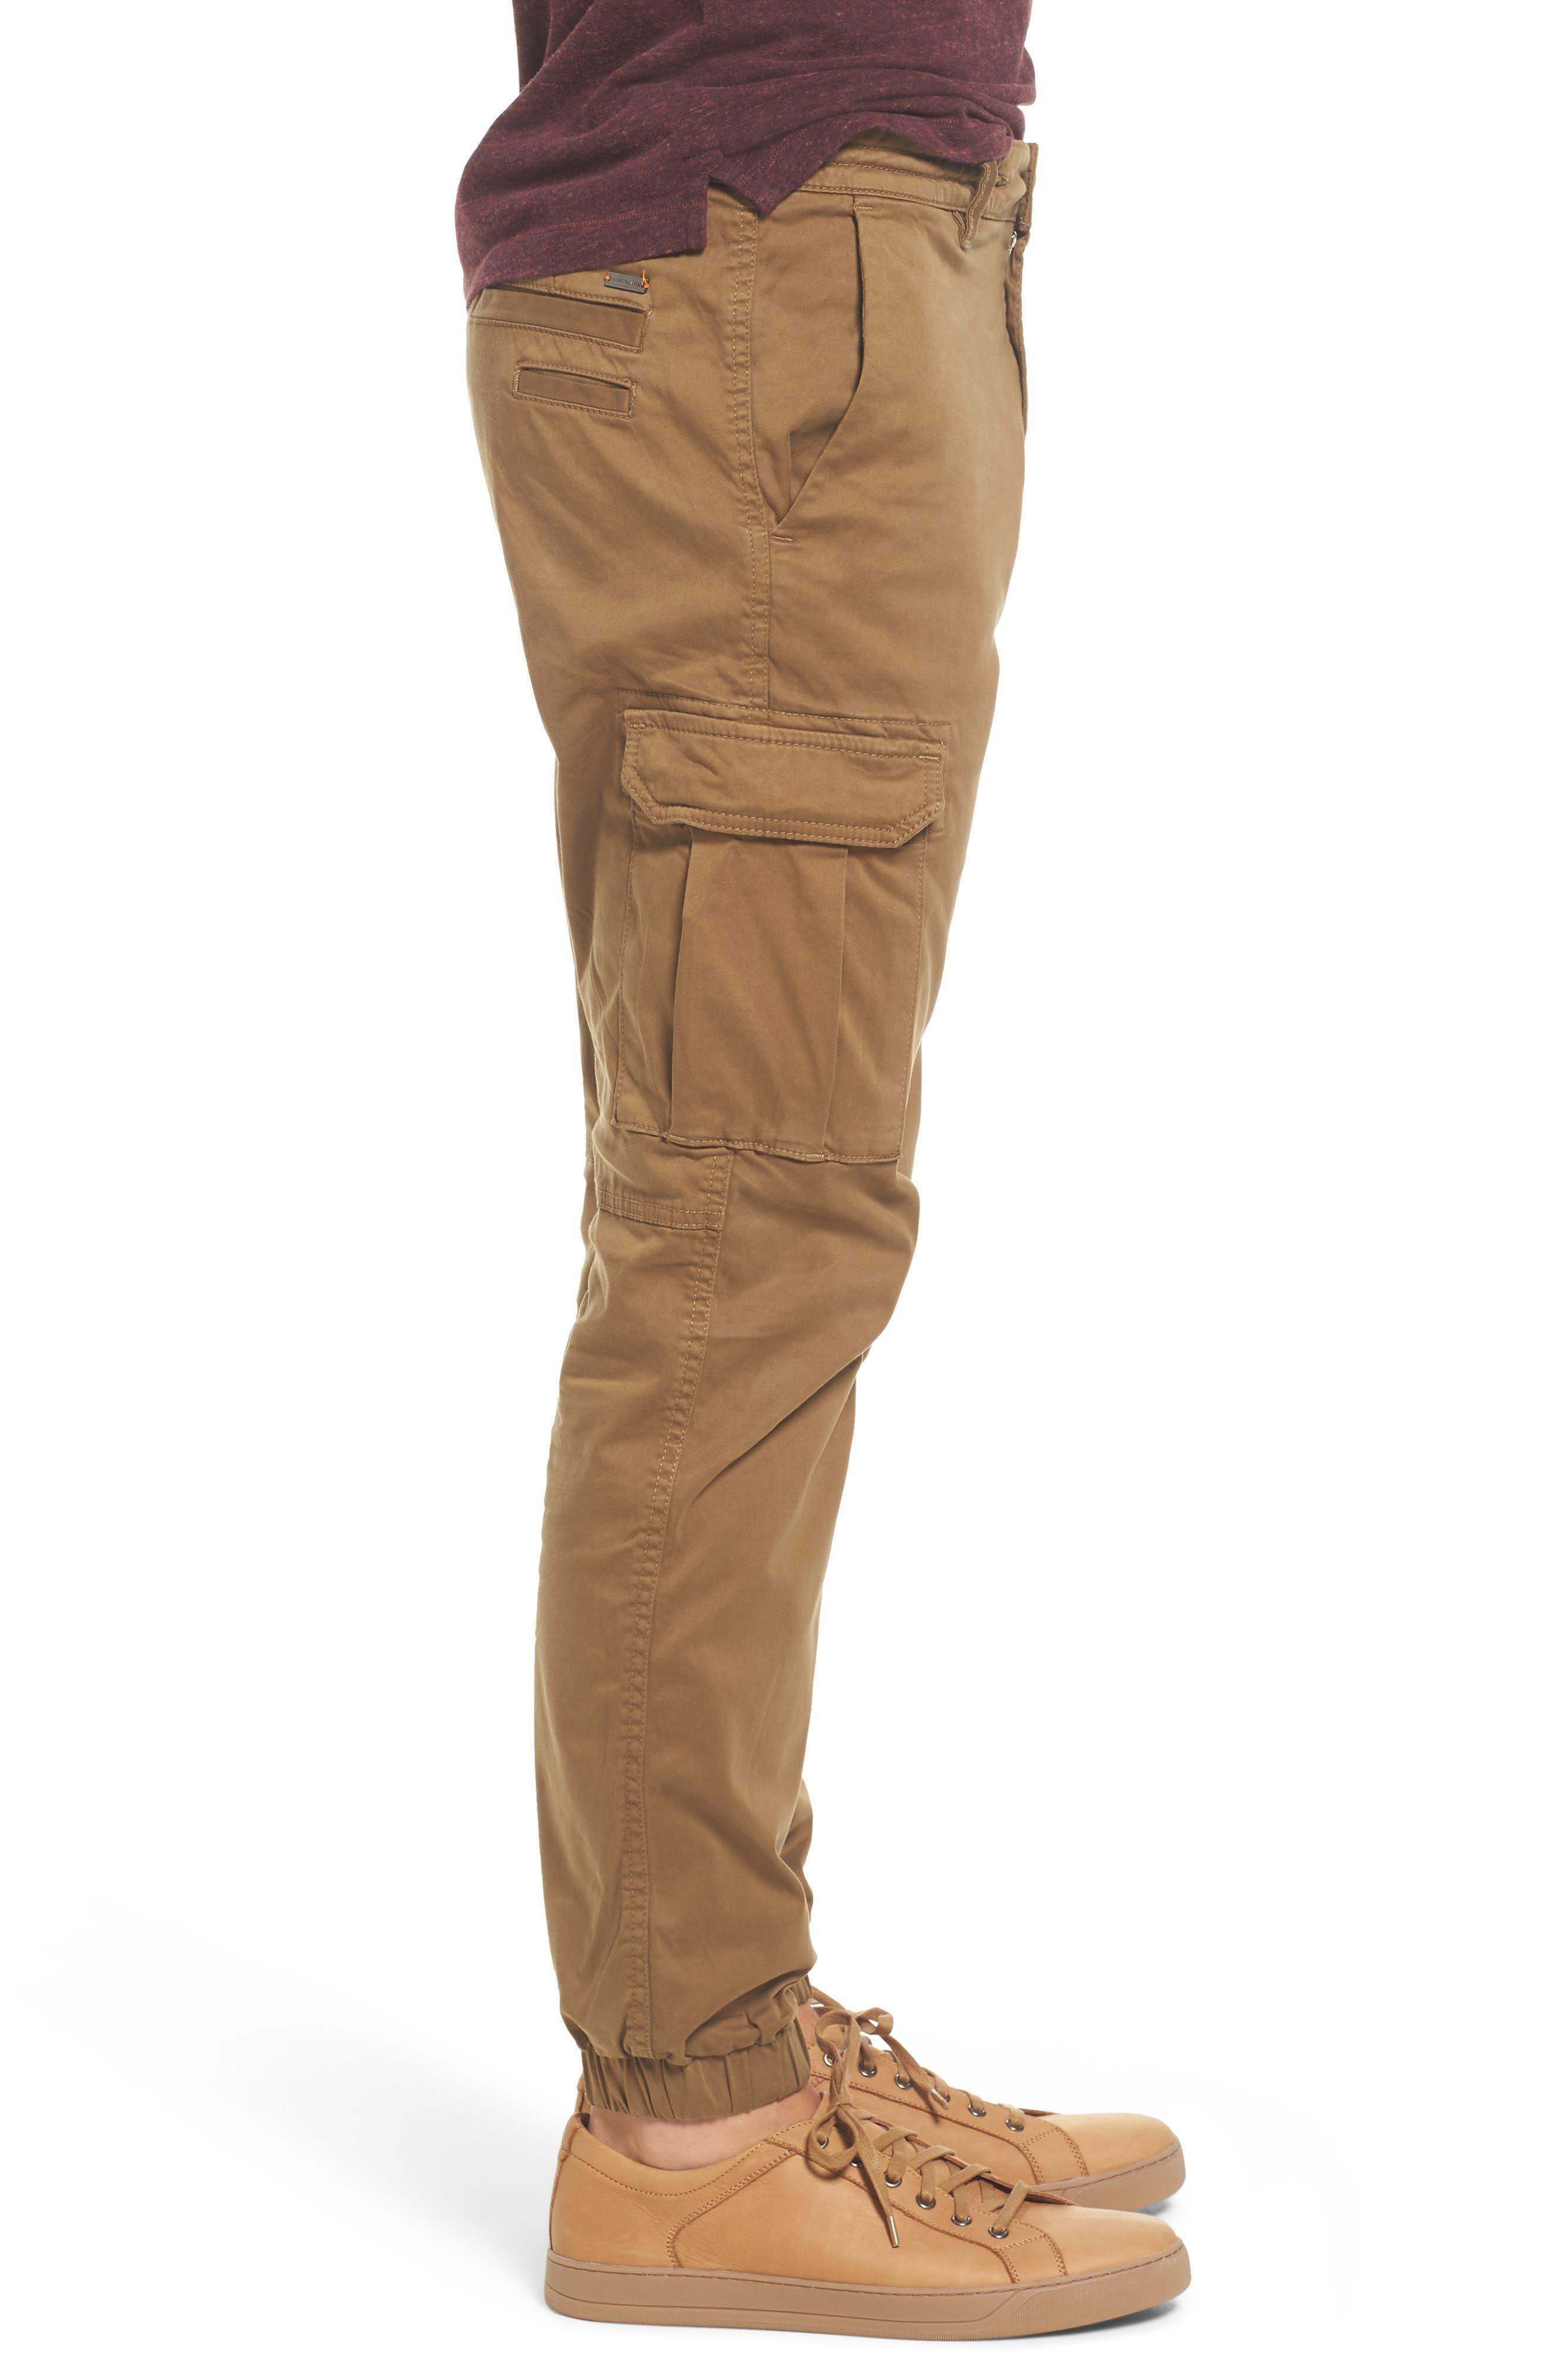 Shay 2 Cargo Pants,                             Alternate thumbnail 3, color,                             Open Beige